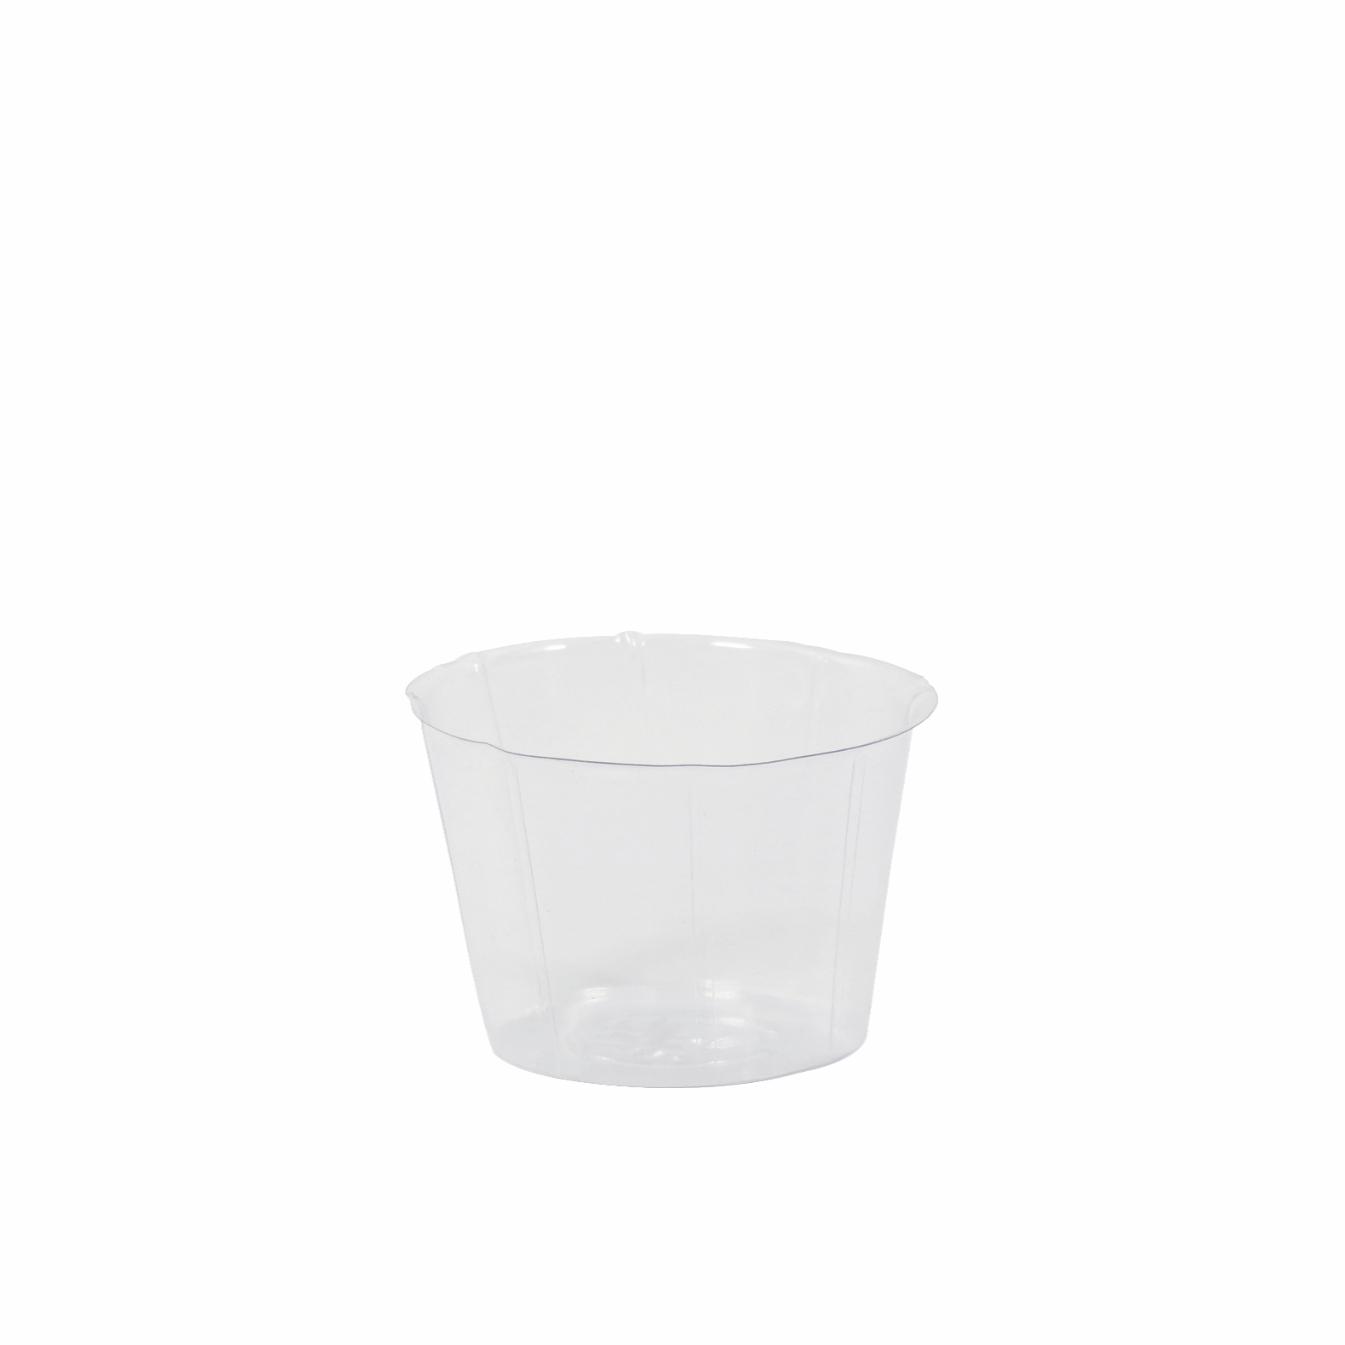 Cachepot de Plástico Transparente Inlay 13x09cm